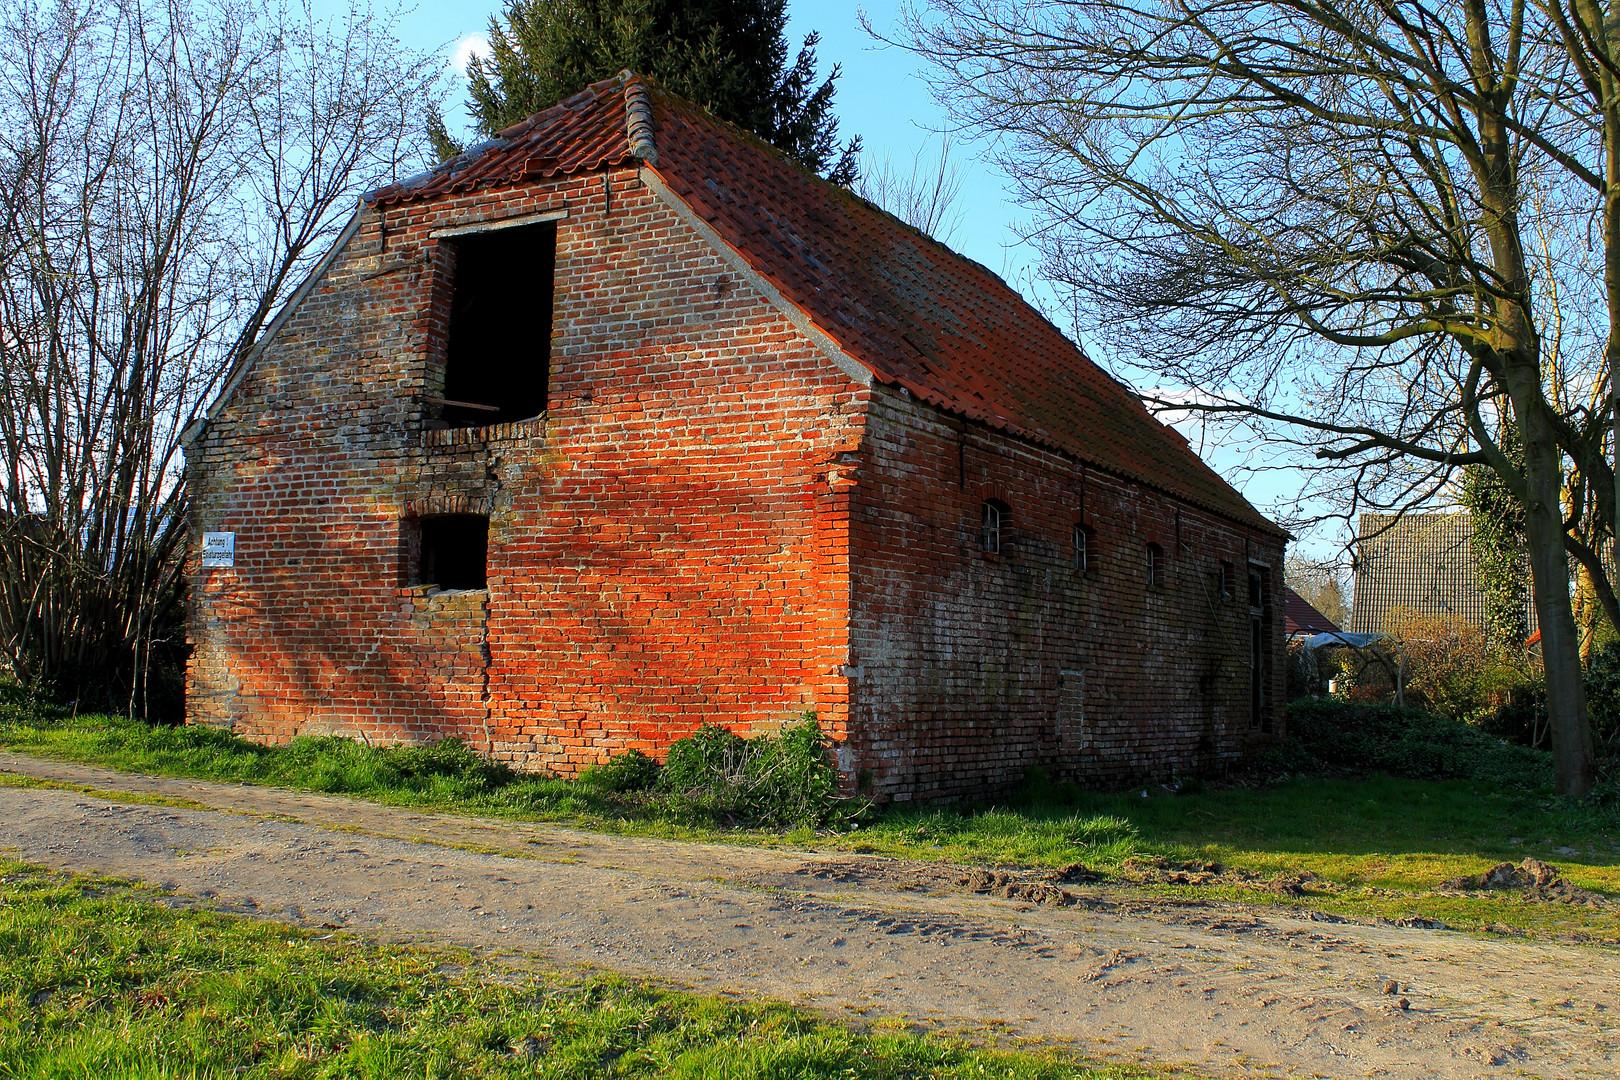 Alte verlassene Scheune